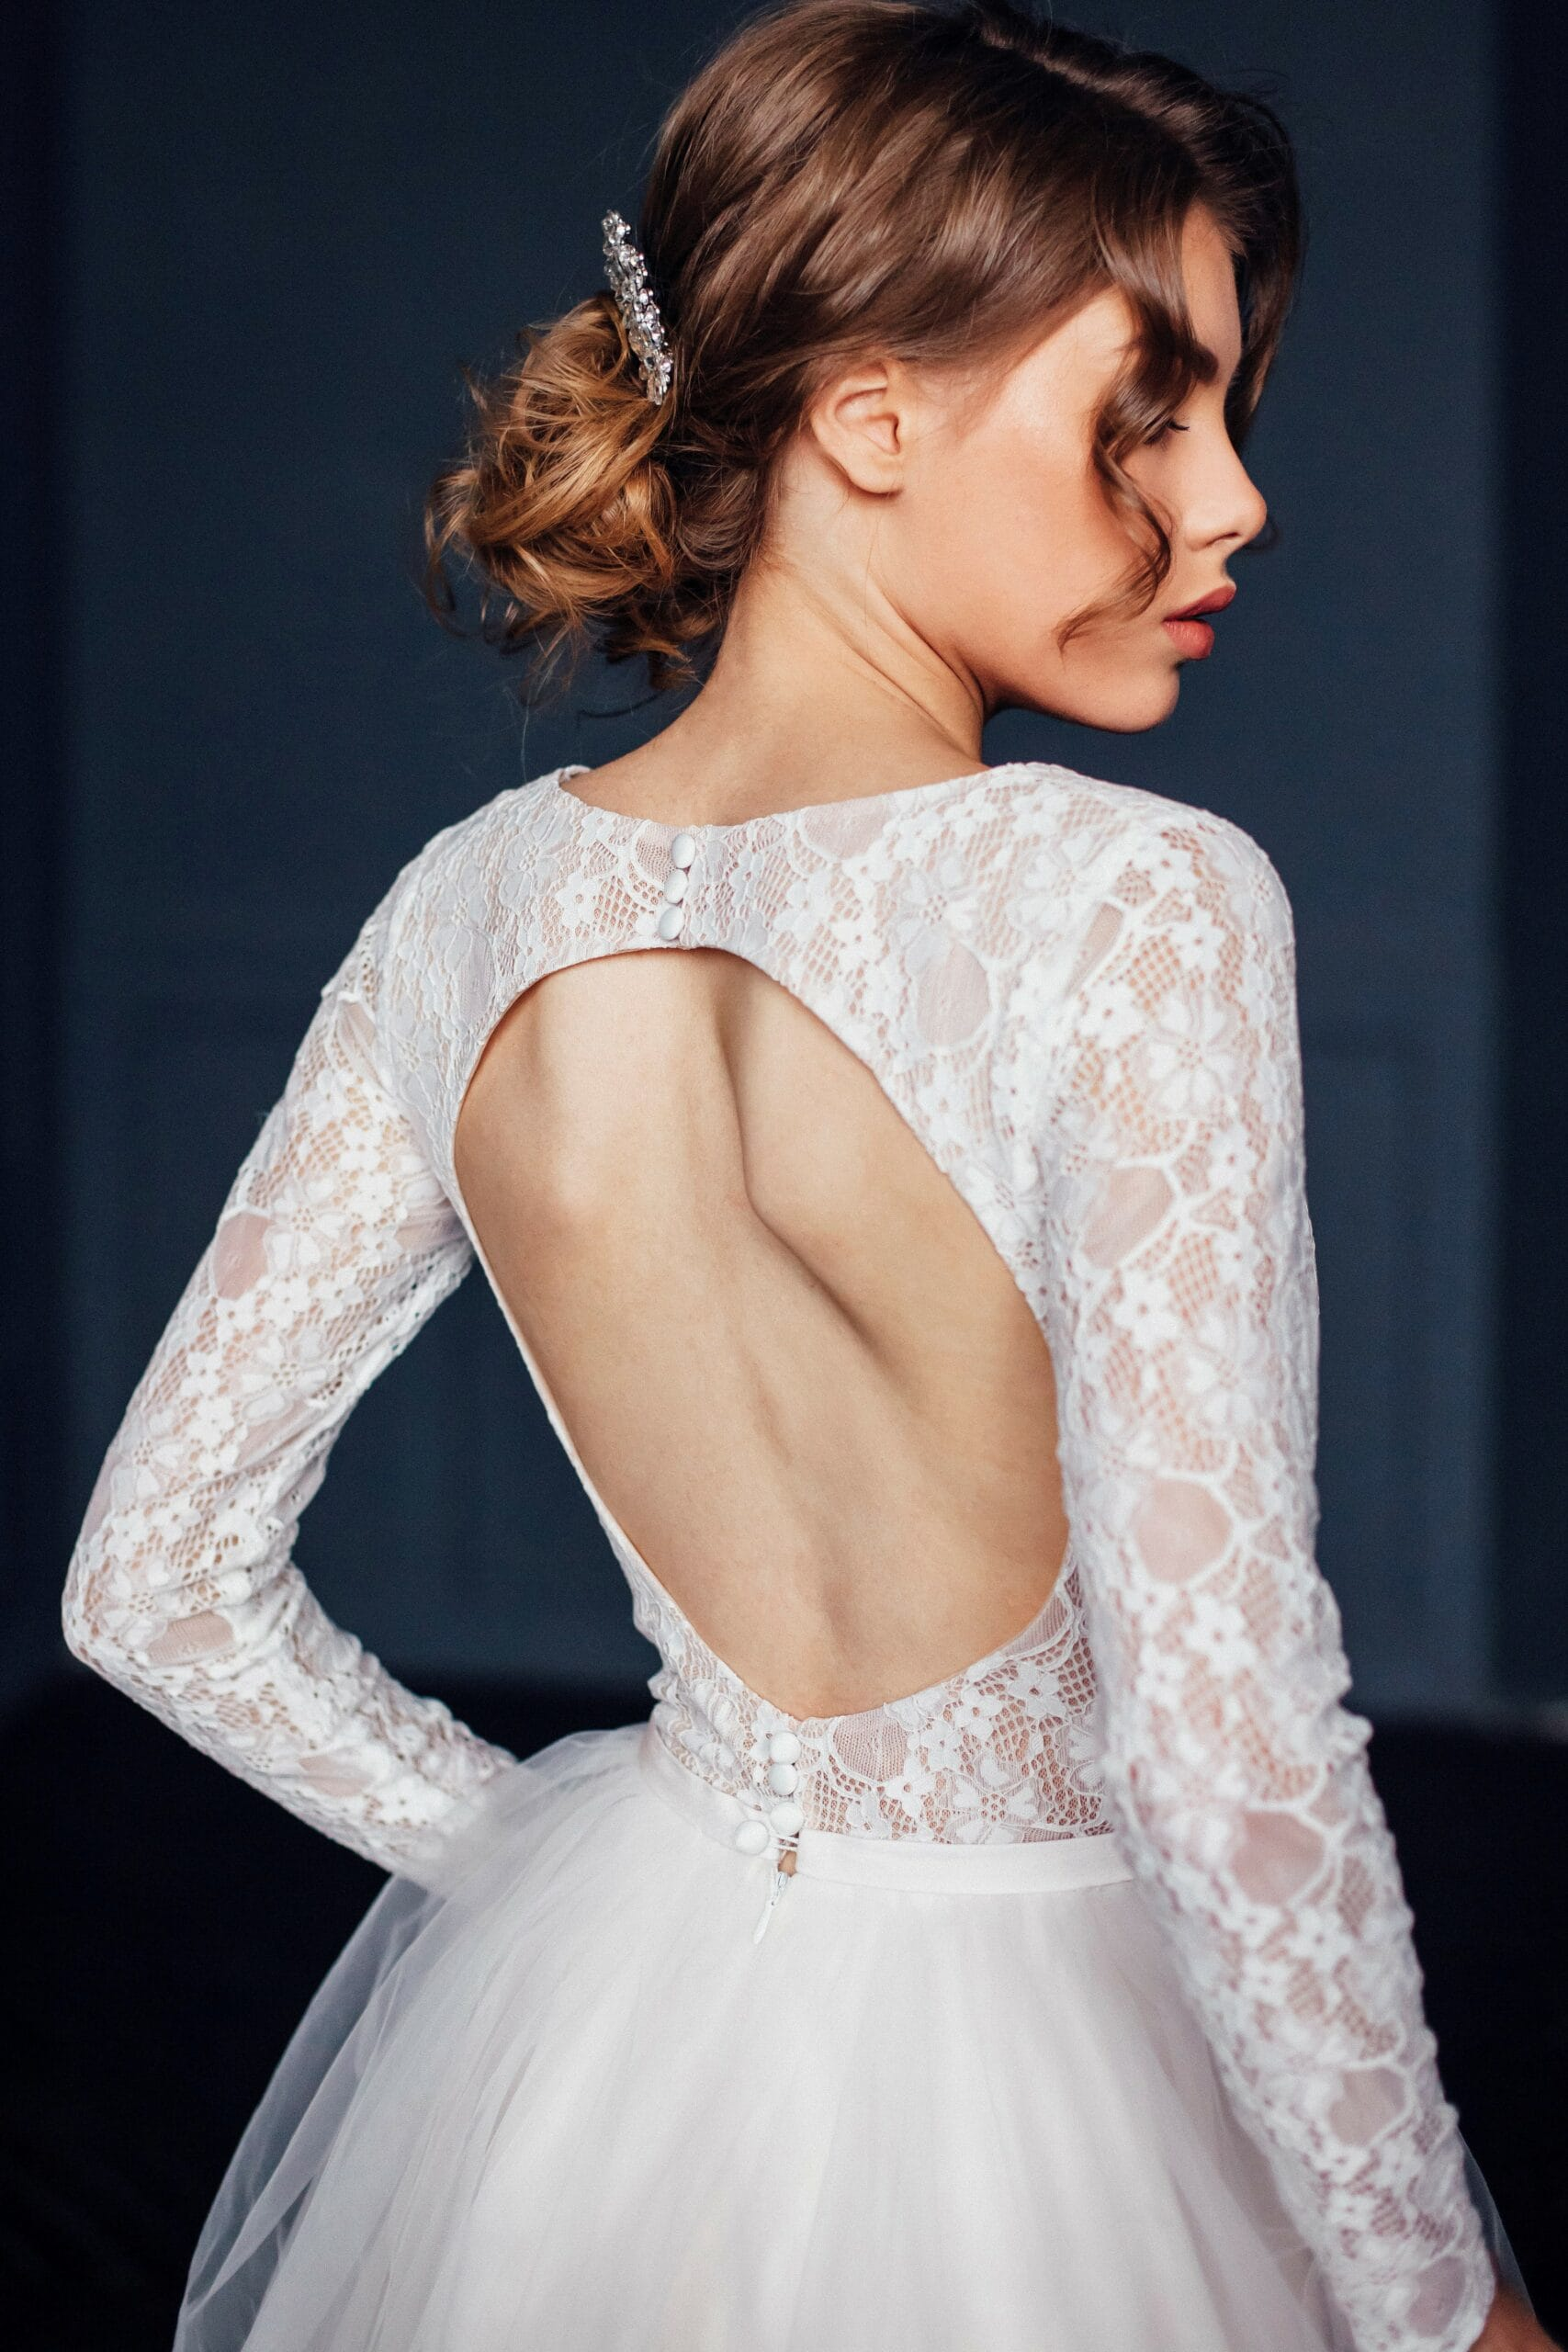 Свадебное платье PENELOPE, коллекция THE ABSOLUTE LOVE, бренд RARE BRIDAL, фото 3